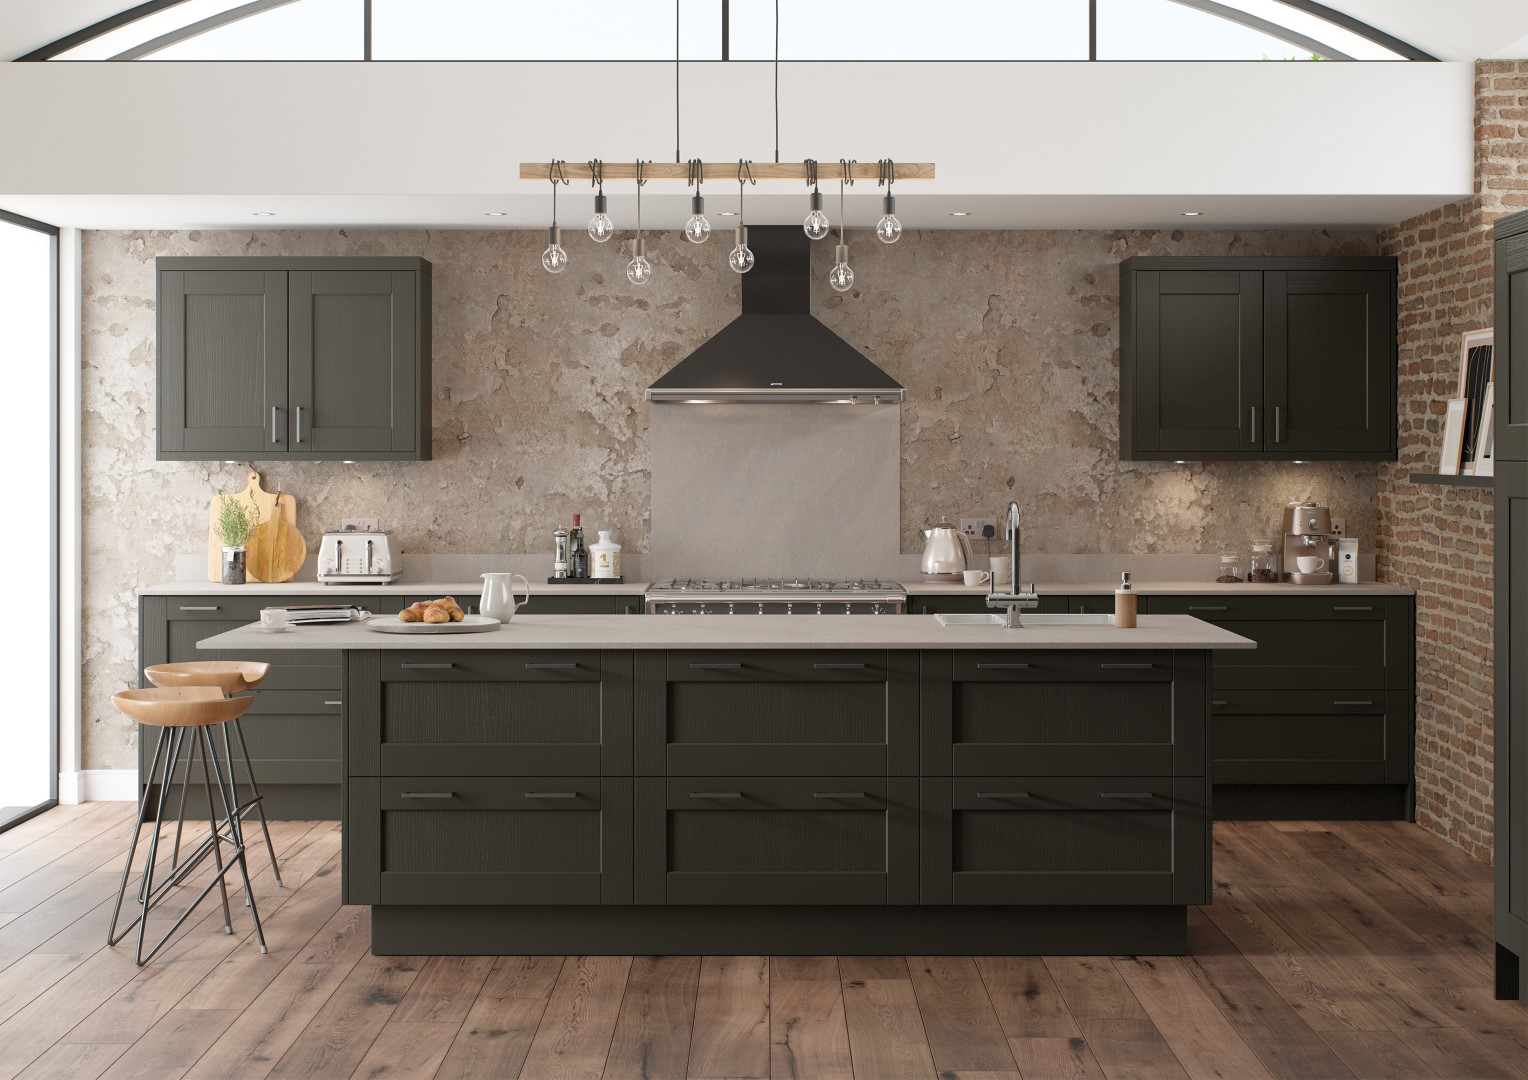 Kensington Graphite - Kitchen Design - Alan Kelly Kitchens Waterford - 1